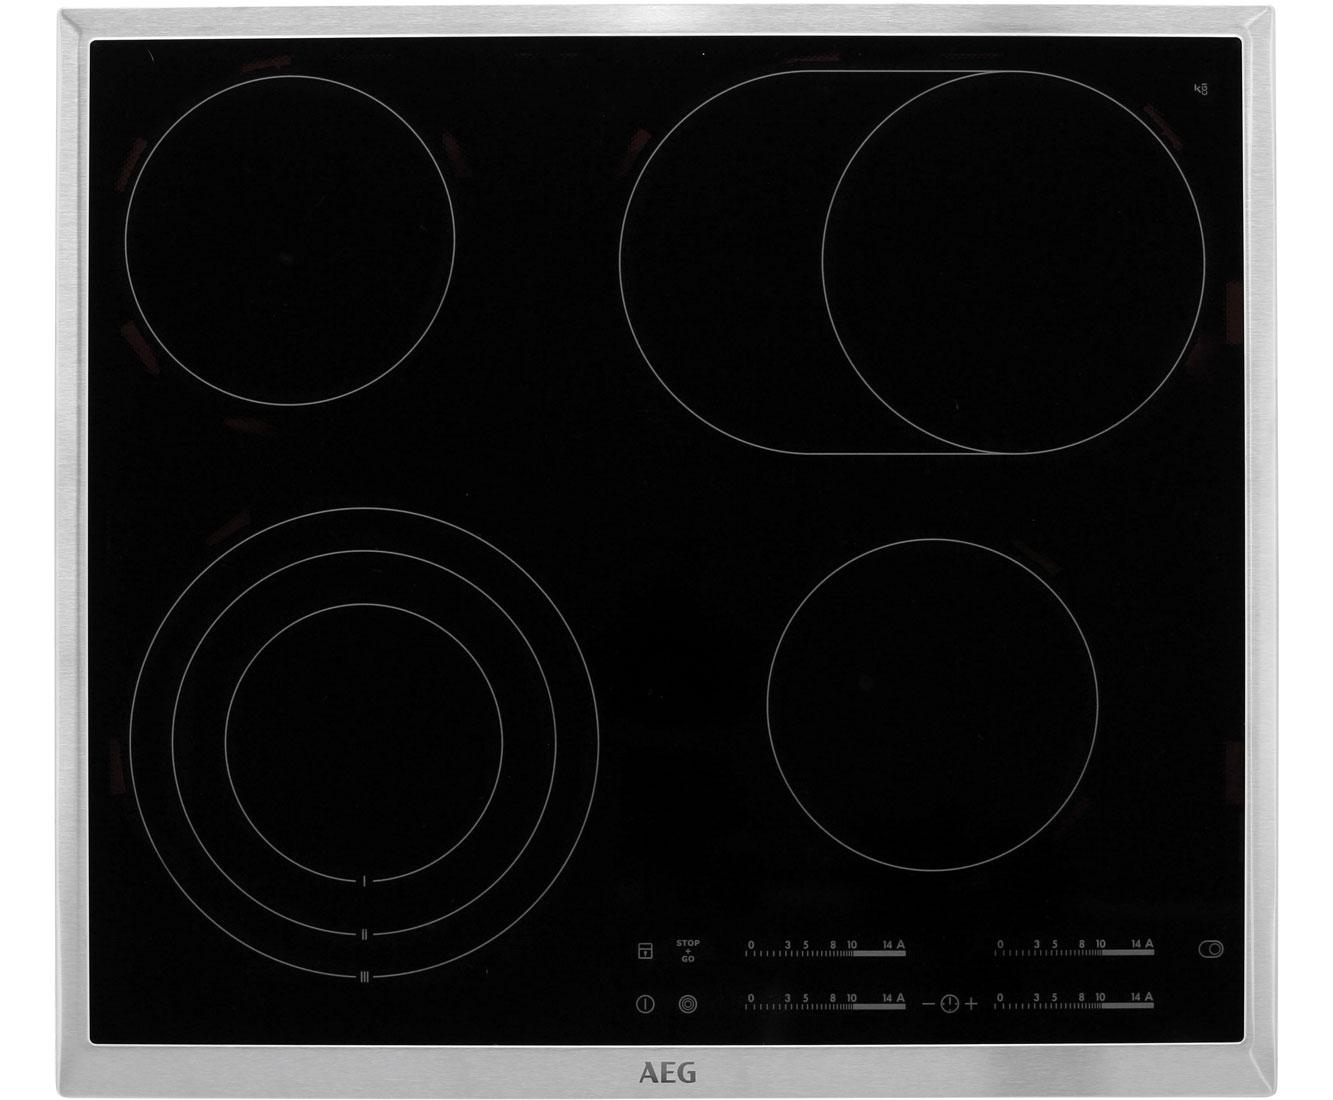 ... AEG HKA6507RAD Glaskeramik Kochfeld, Autark, 60er Breite    HKA6507RAD_BK   1 ...